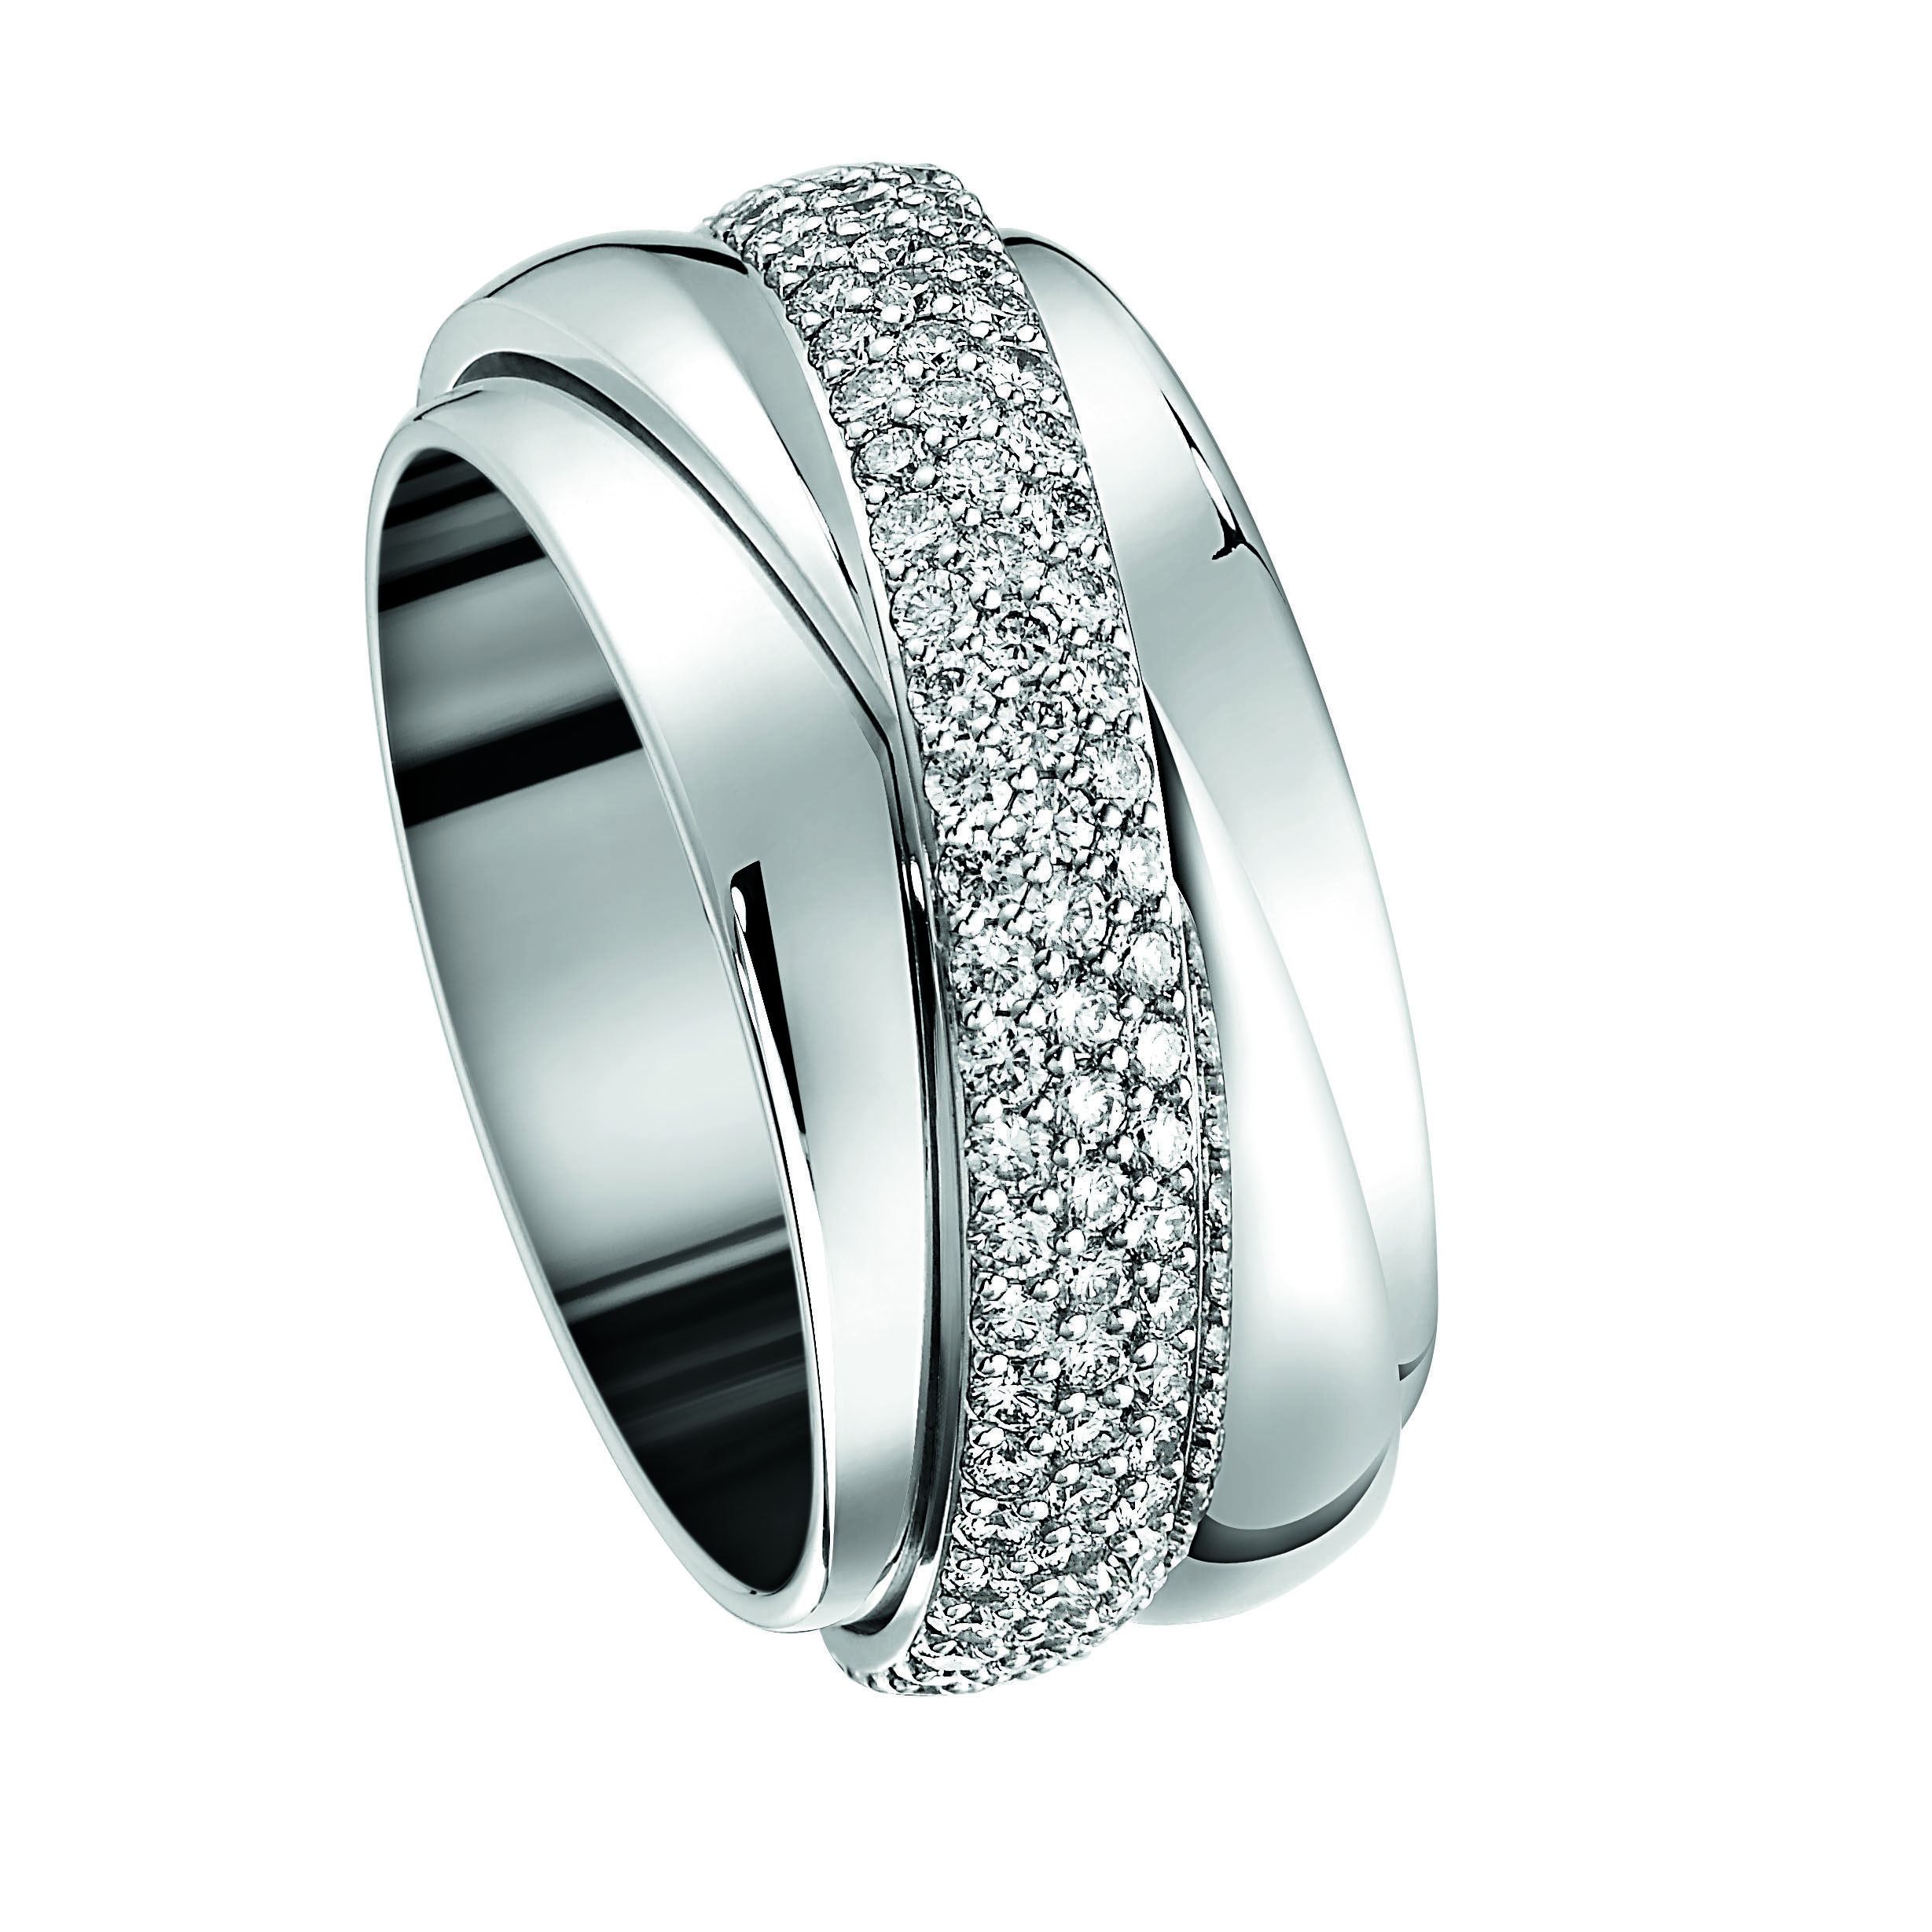 Piaget Possession Entrelacée.   18-carat white gold ring set with 147 brilliant-cut diamonds